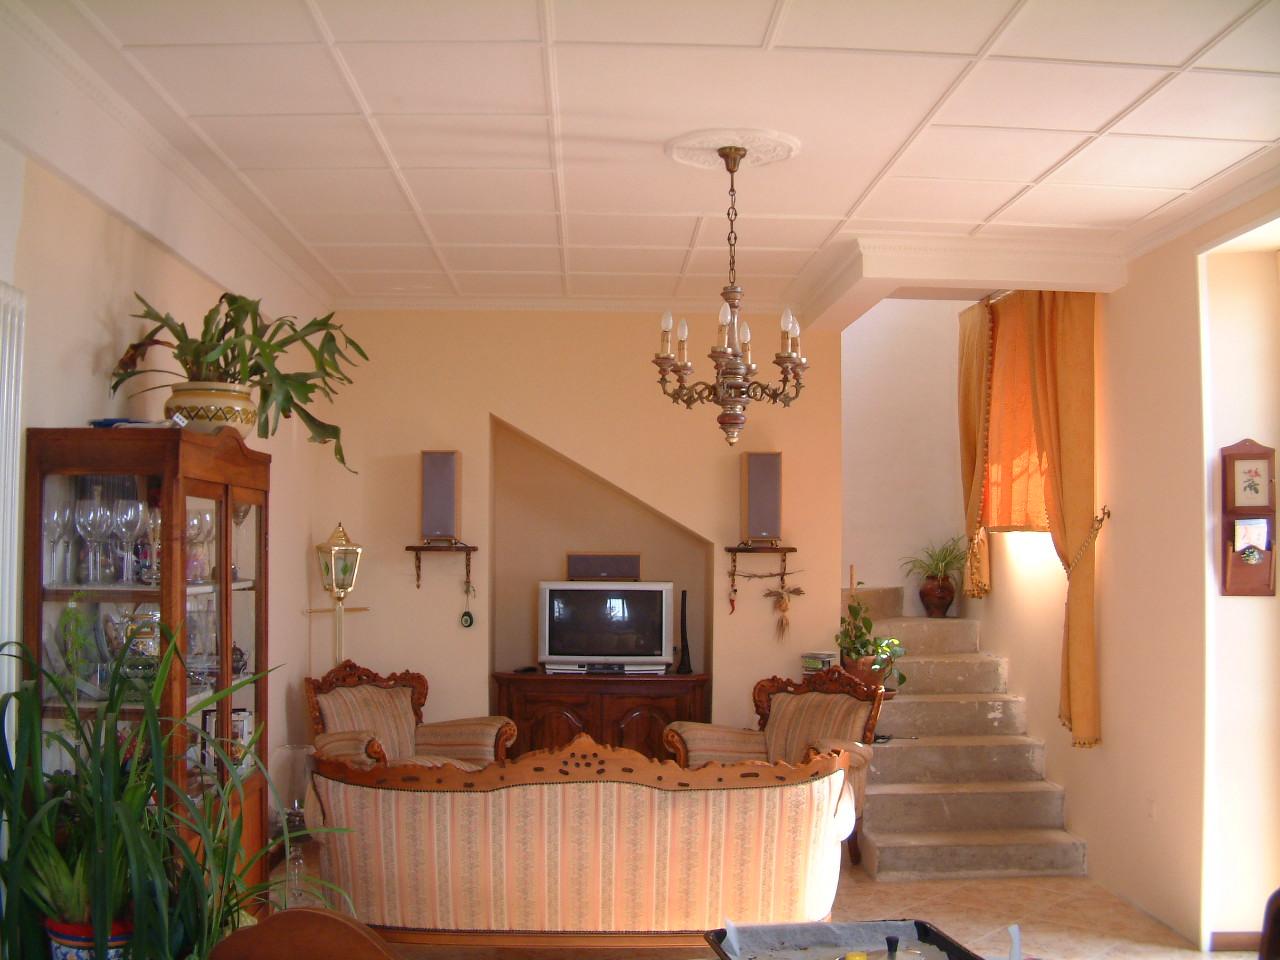 Immobili in vendita agenzie immobiliari in franchising - Agenzie immobiliari bruxelles ...